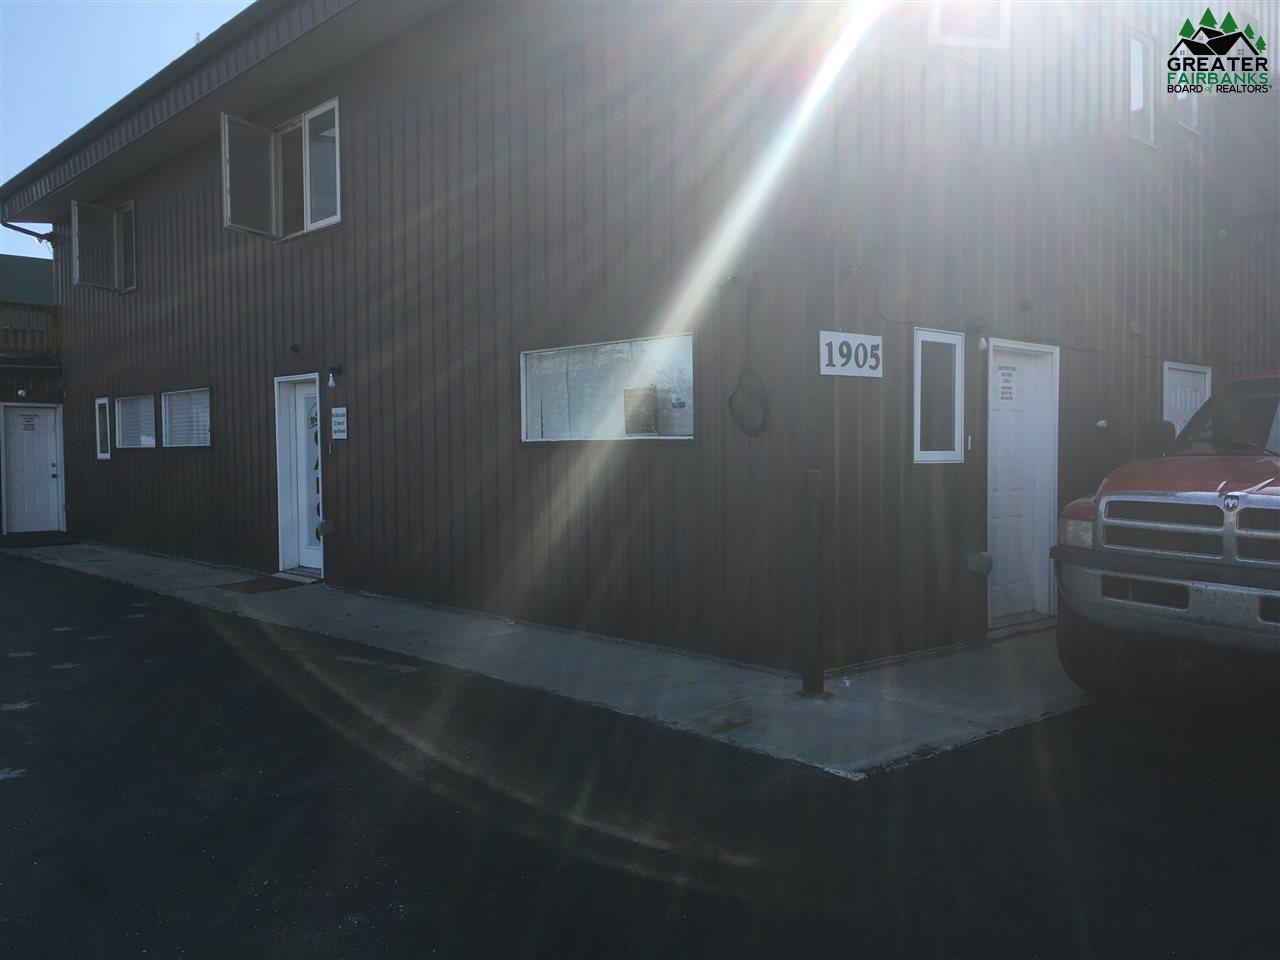 1905 Livengood Avenue, Fairbanks, AK 99701